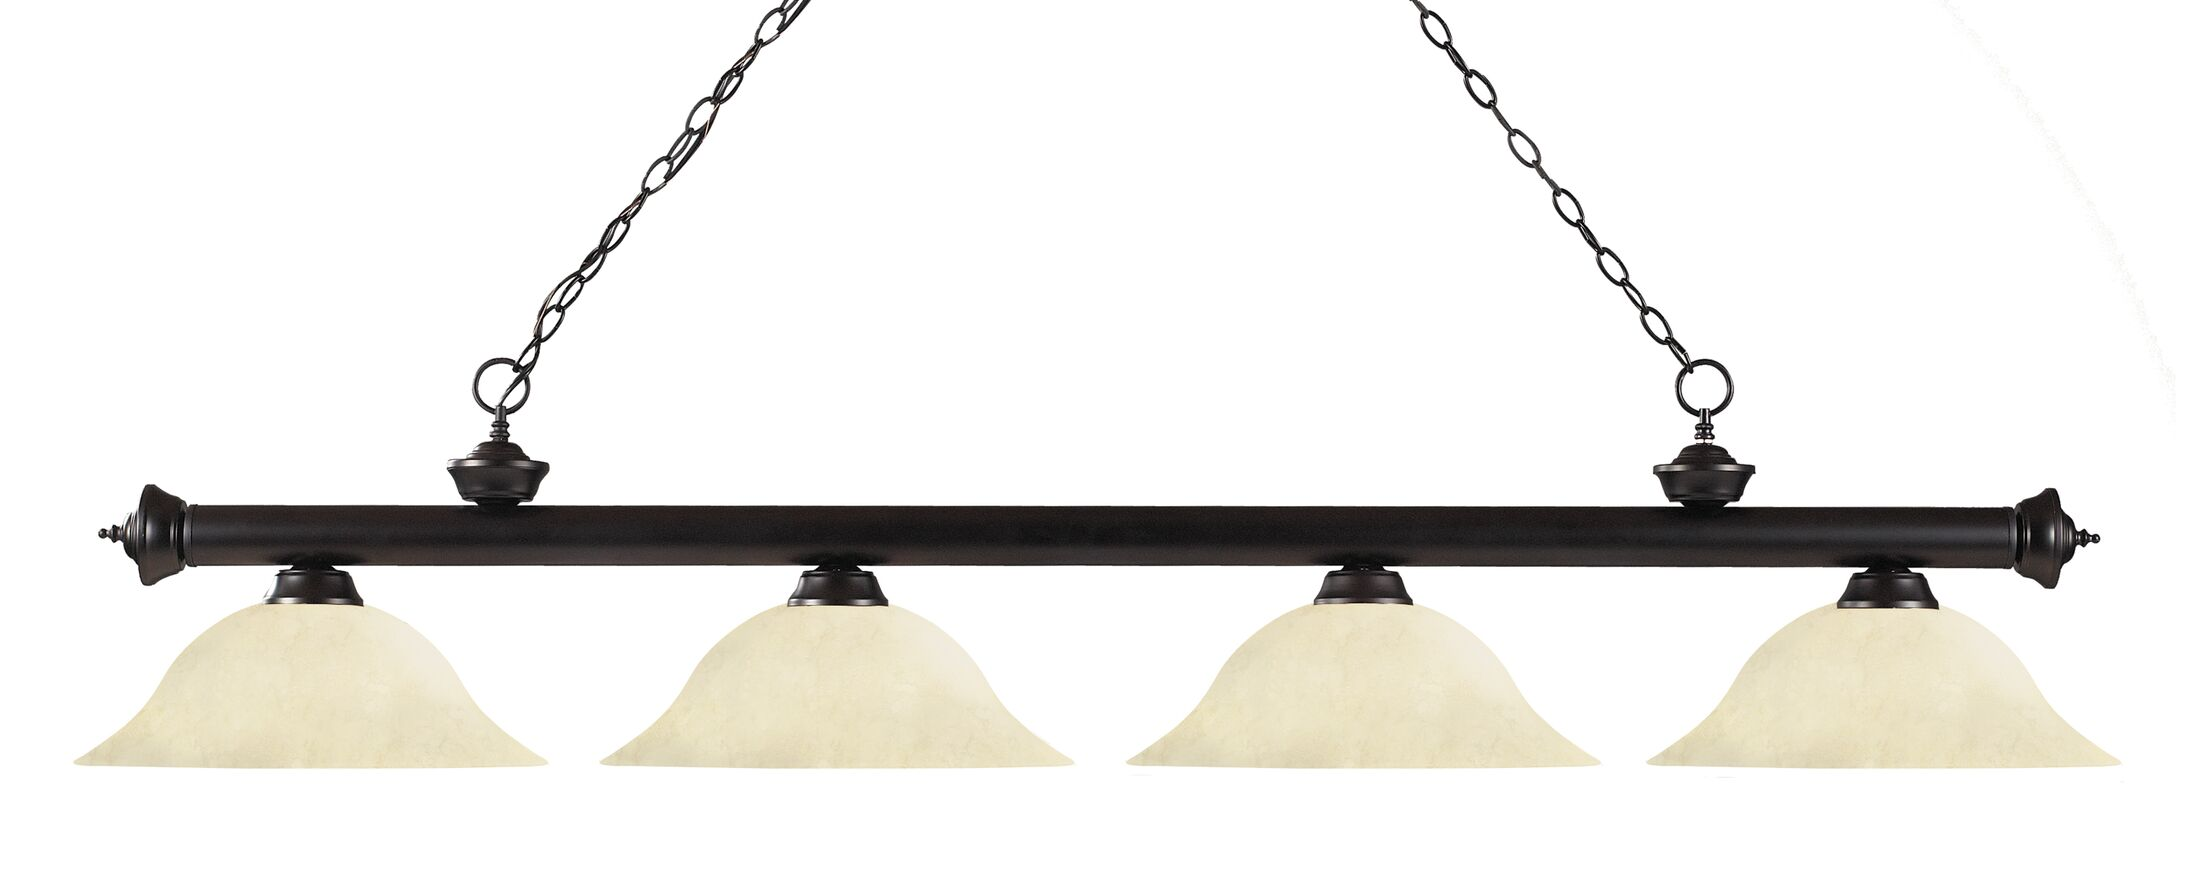 Zephyr 4-Light Steel Kitchen Island Pendant Shade Color: Golden Mottle, Finish: Bronze